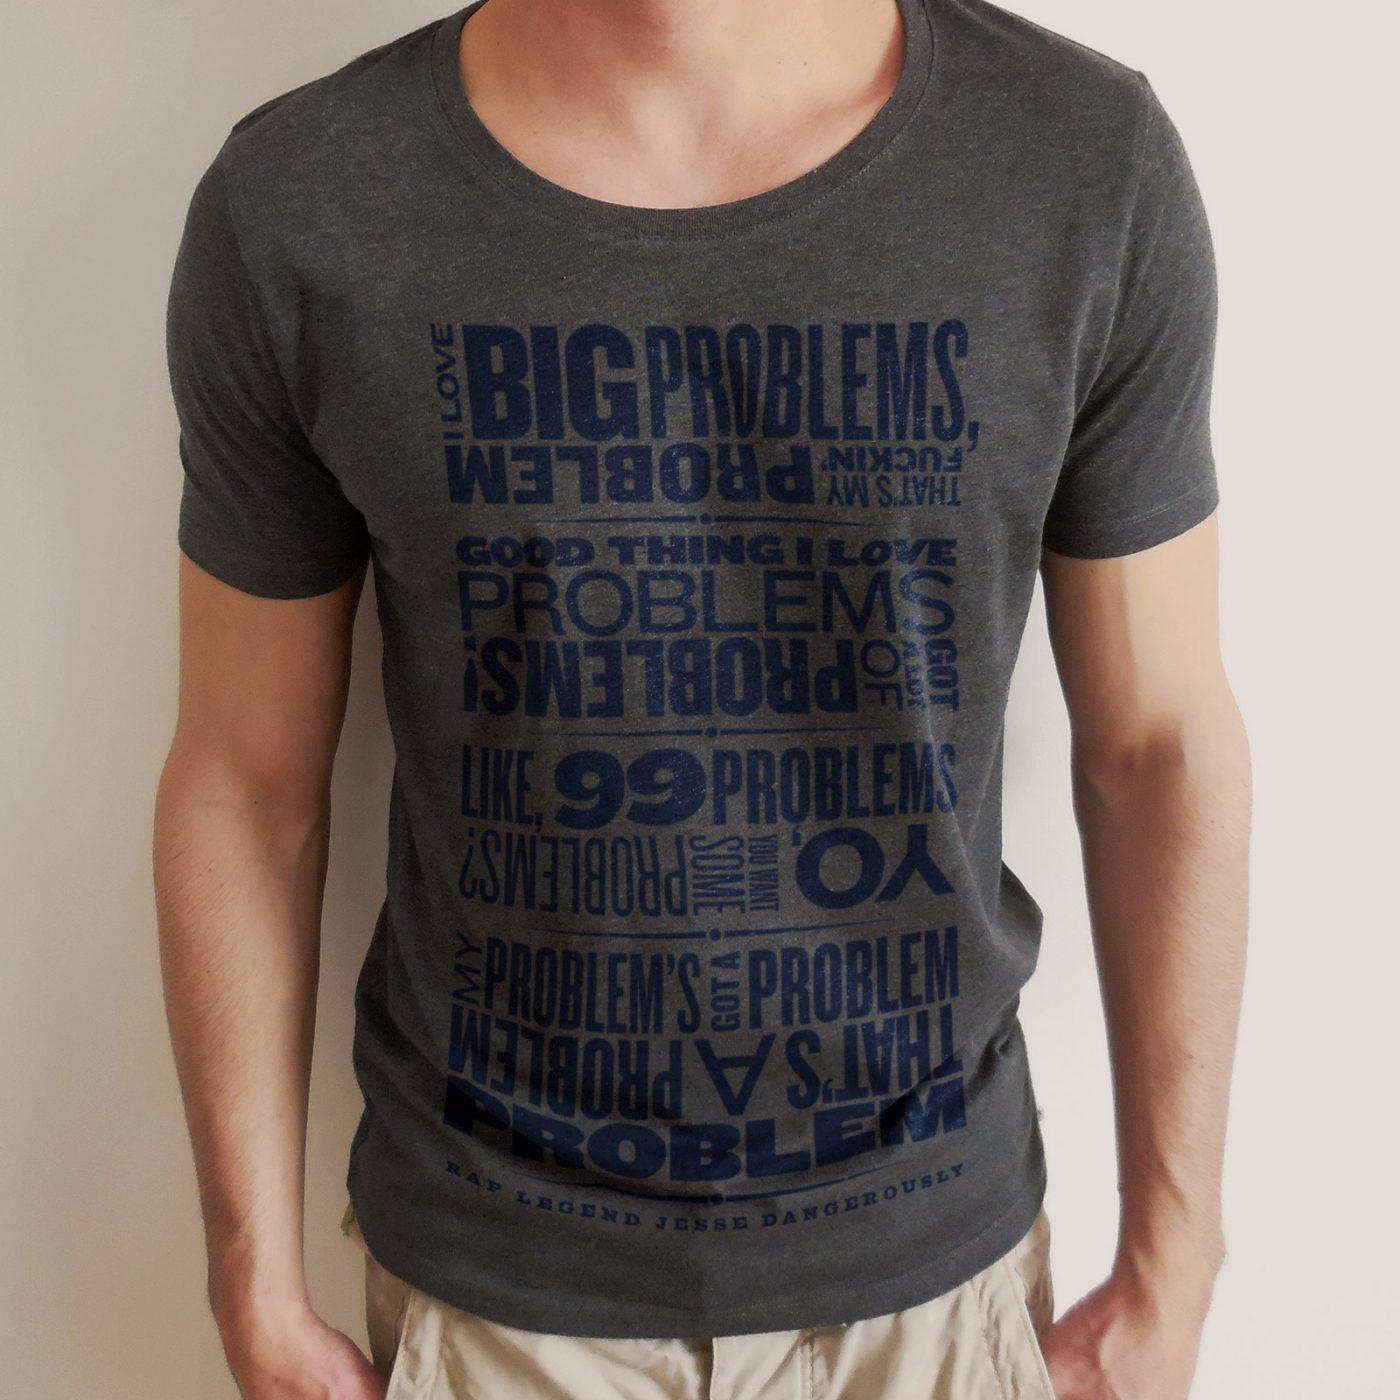 jesse-dangerously-problems-t-shirt-3